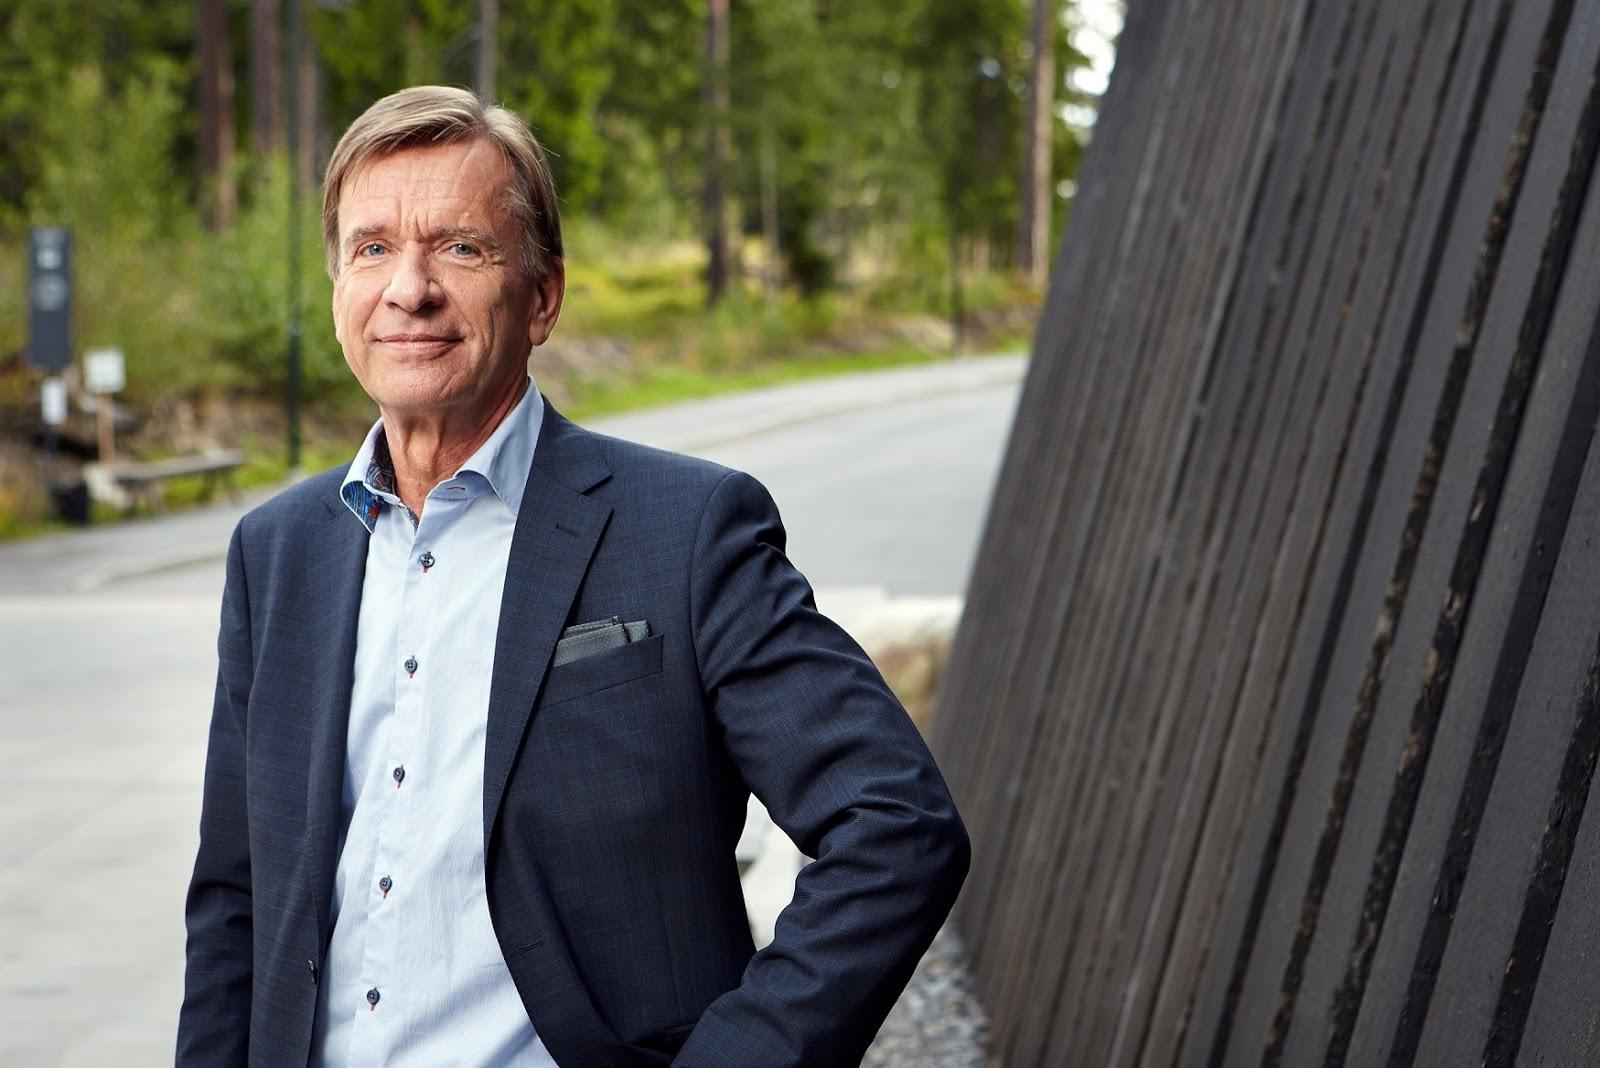 VOLVO HAKAN2BSAMUELSSON PRESIDENT2B25262BCEO Η Volvo εξαγόρασε βελτιωτικό οίκο, ετοιμάζει μοντέλα 400 ίππων Polestar, Volvo, Volvo S60, Volvo V60